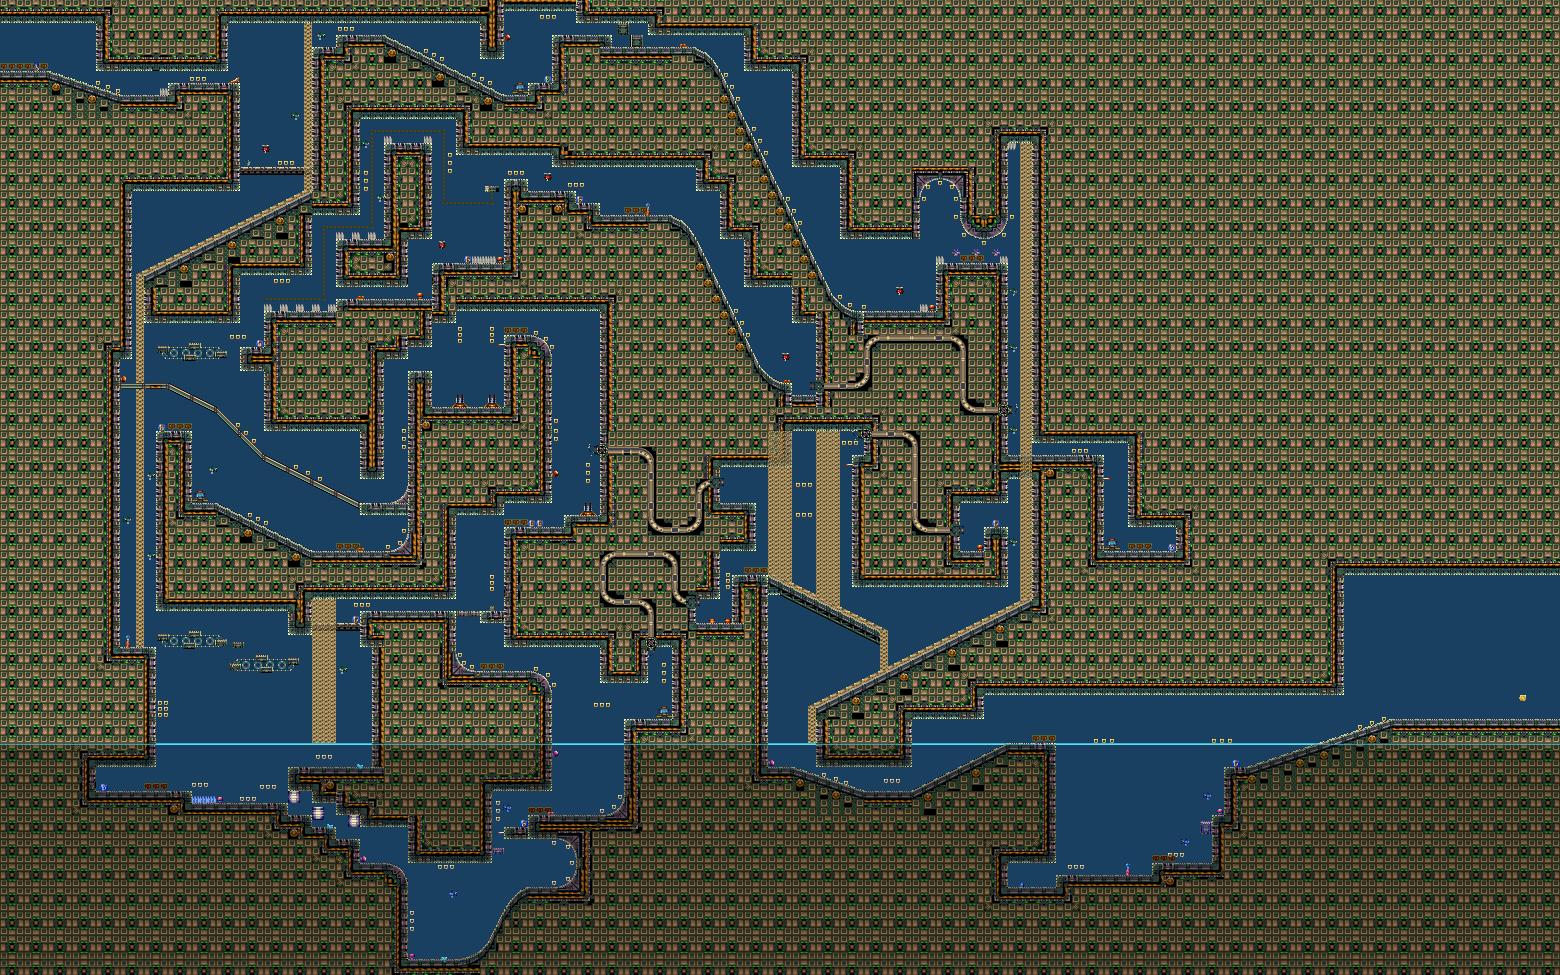 Sonic Advance 3 Maps - The Sonic Center